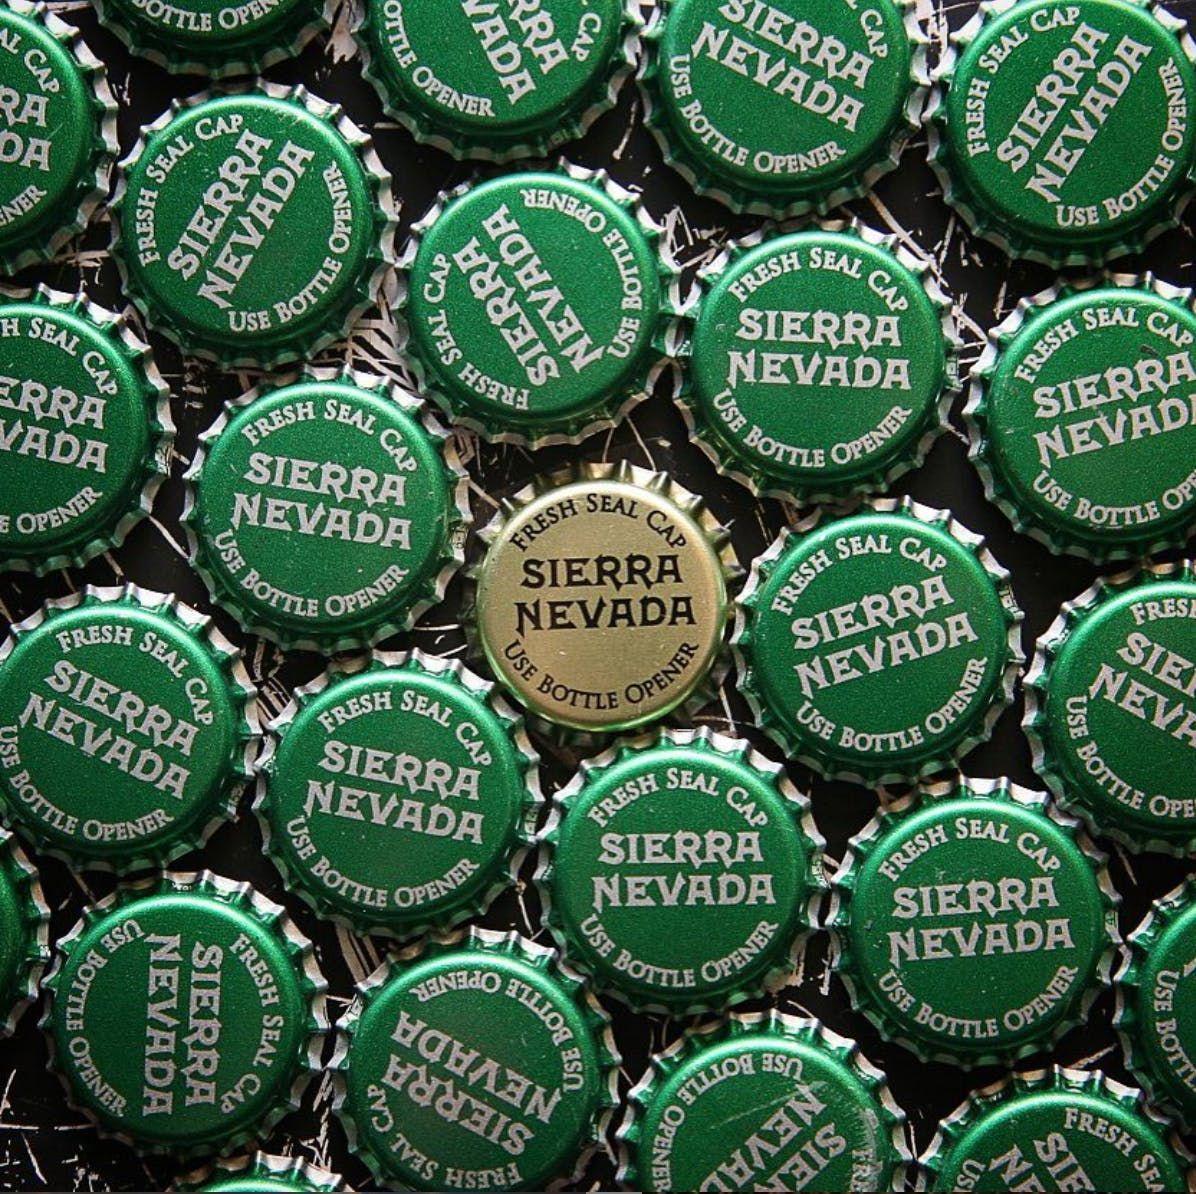 January Beer Dinner with Sierra Nevada